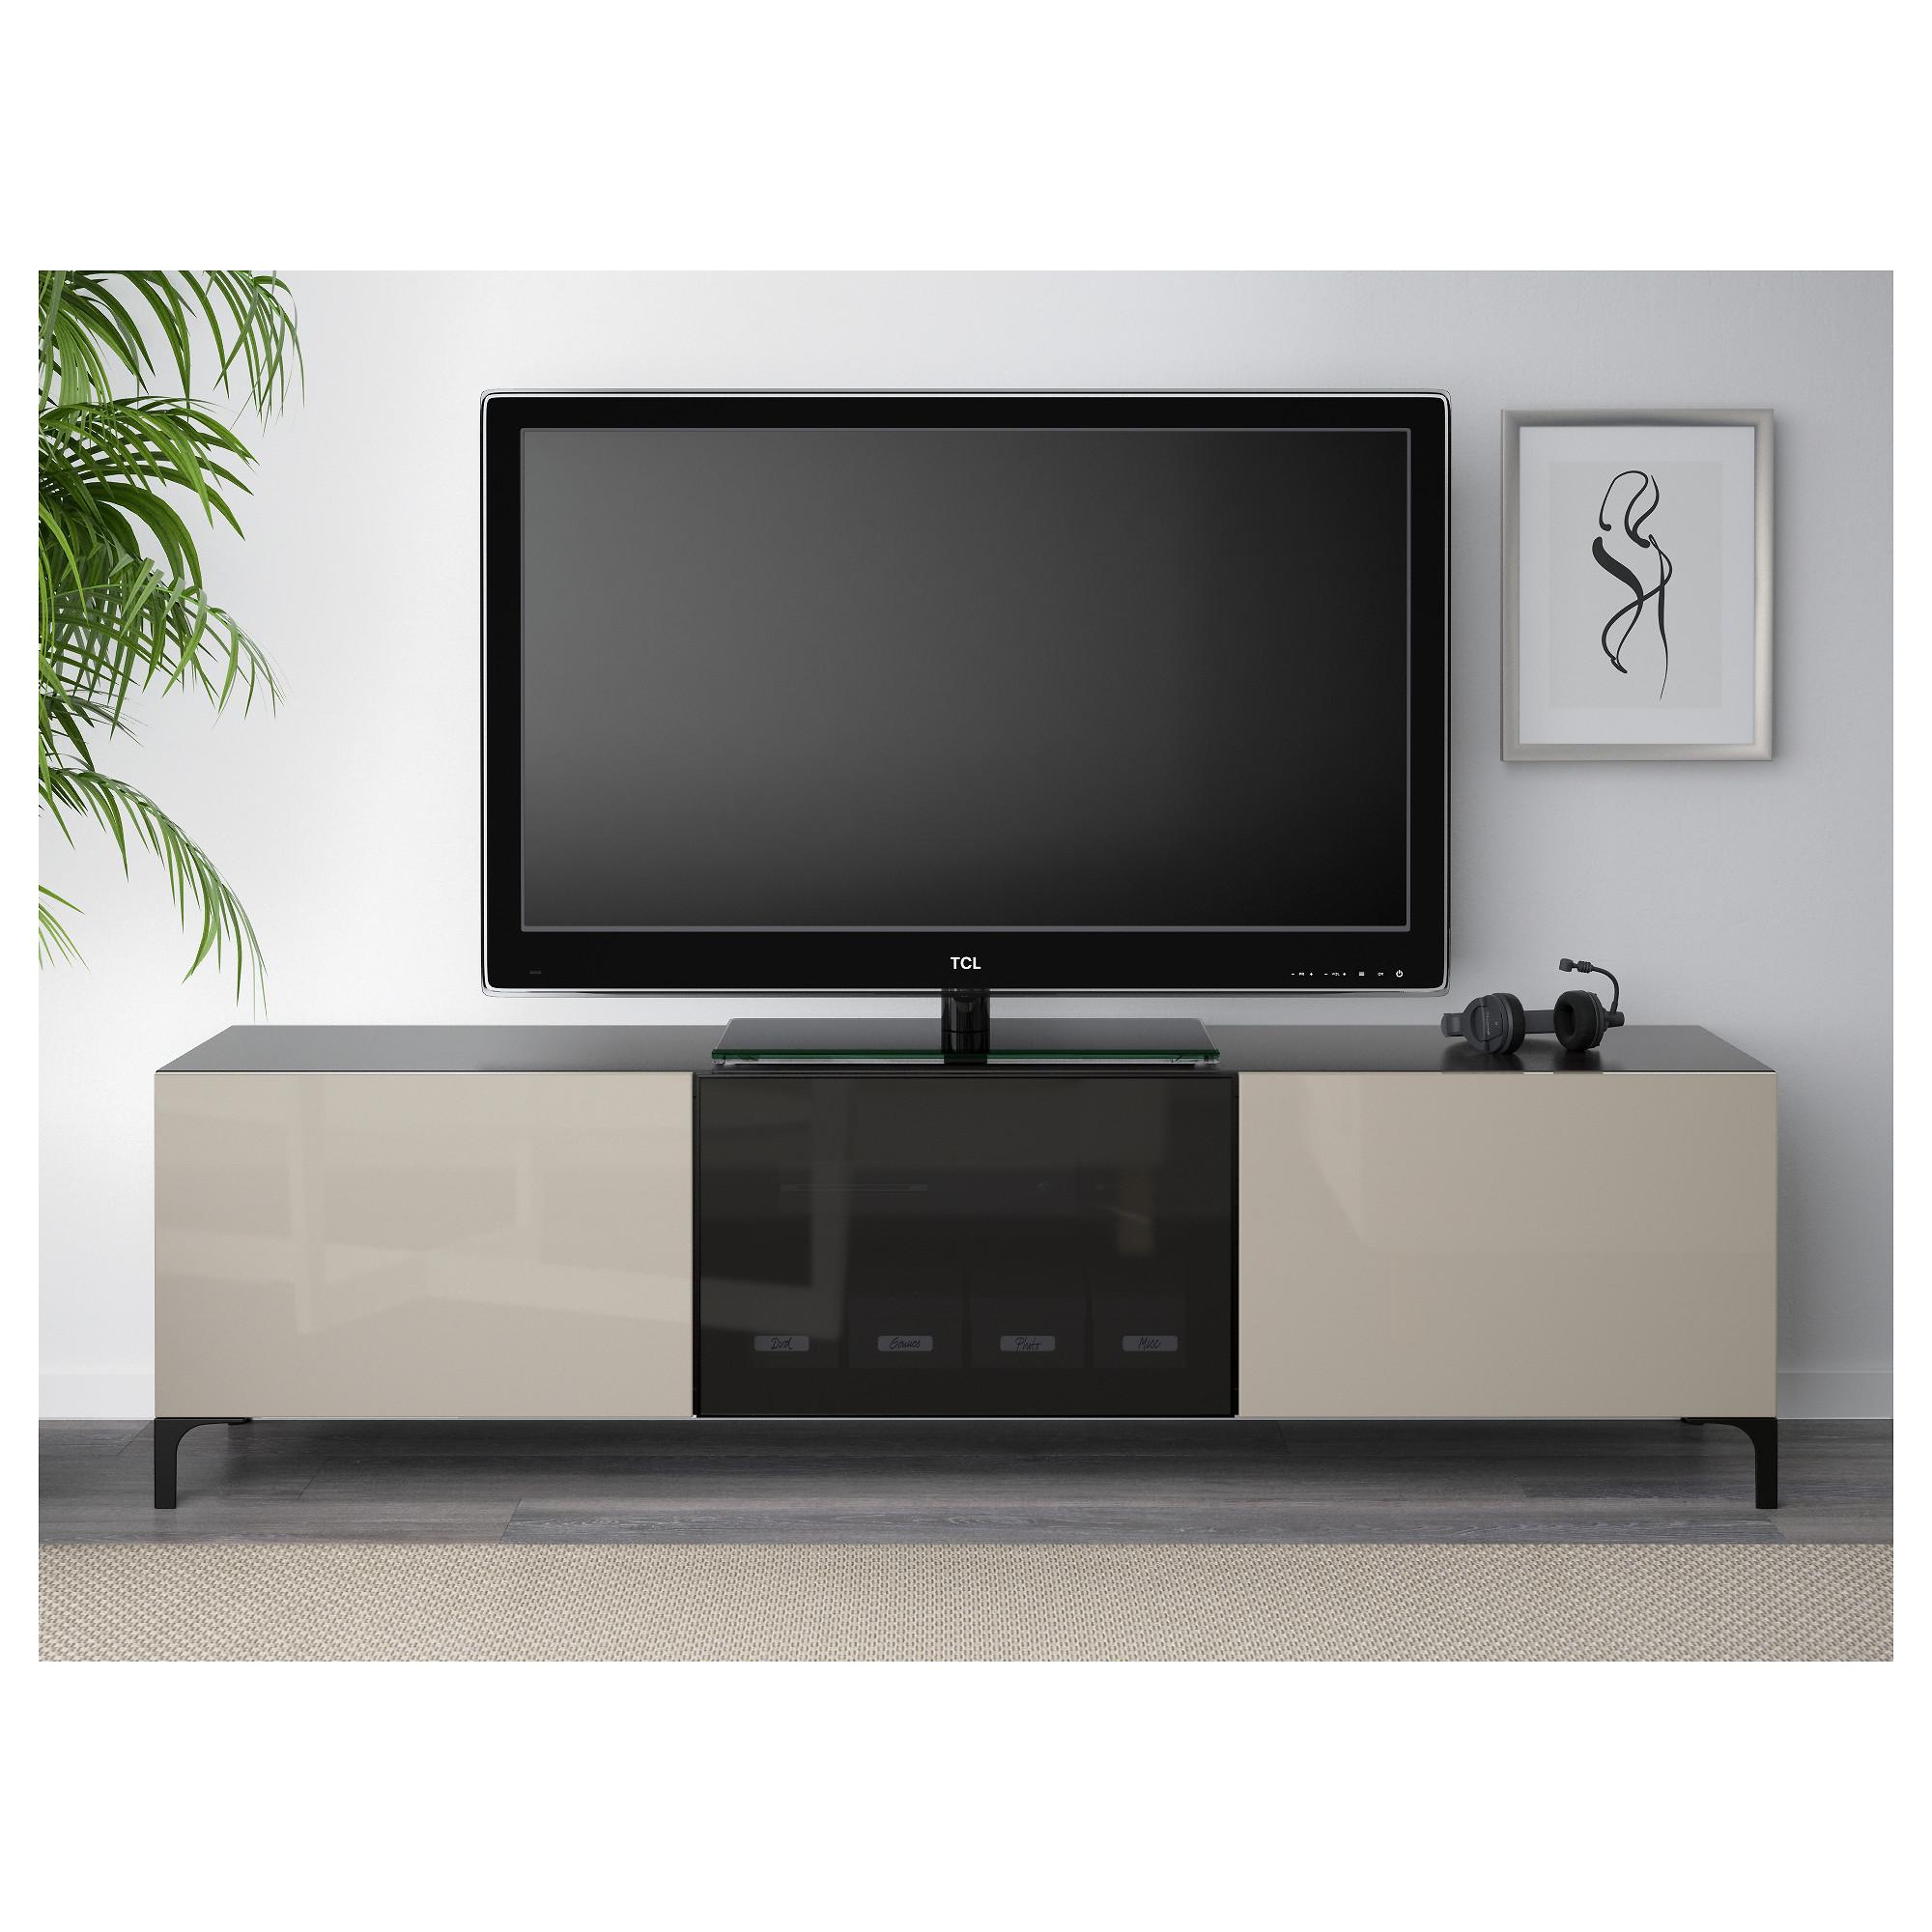 Ikea Latvia Shop For Furniture Lighting Home Accessories